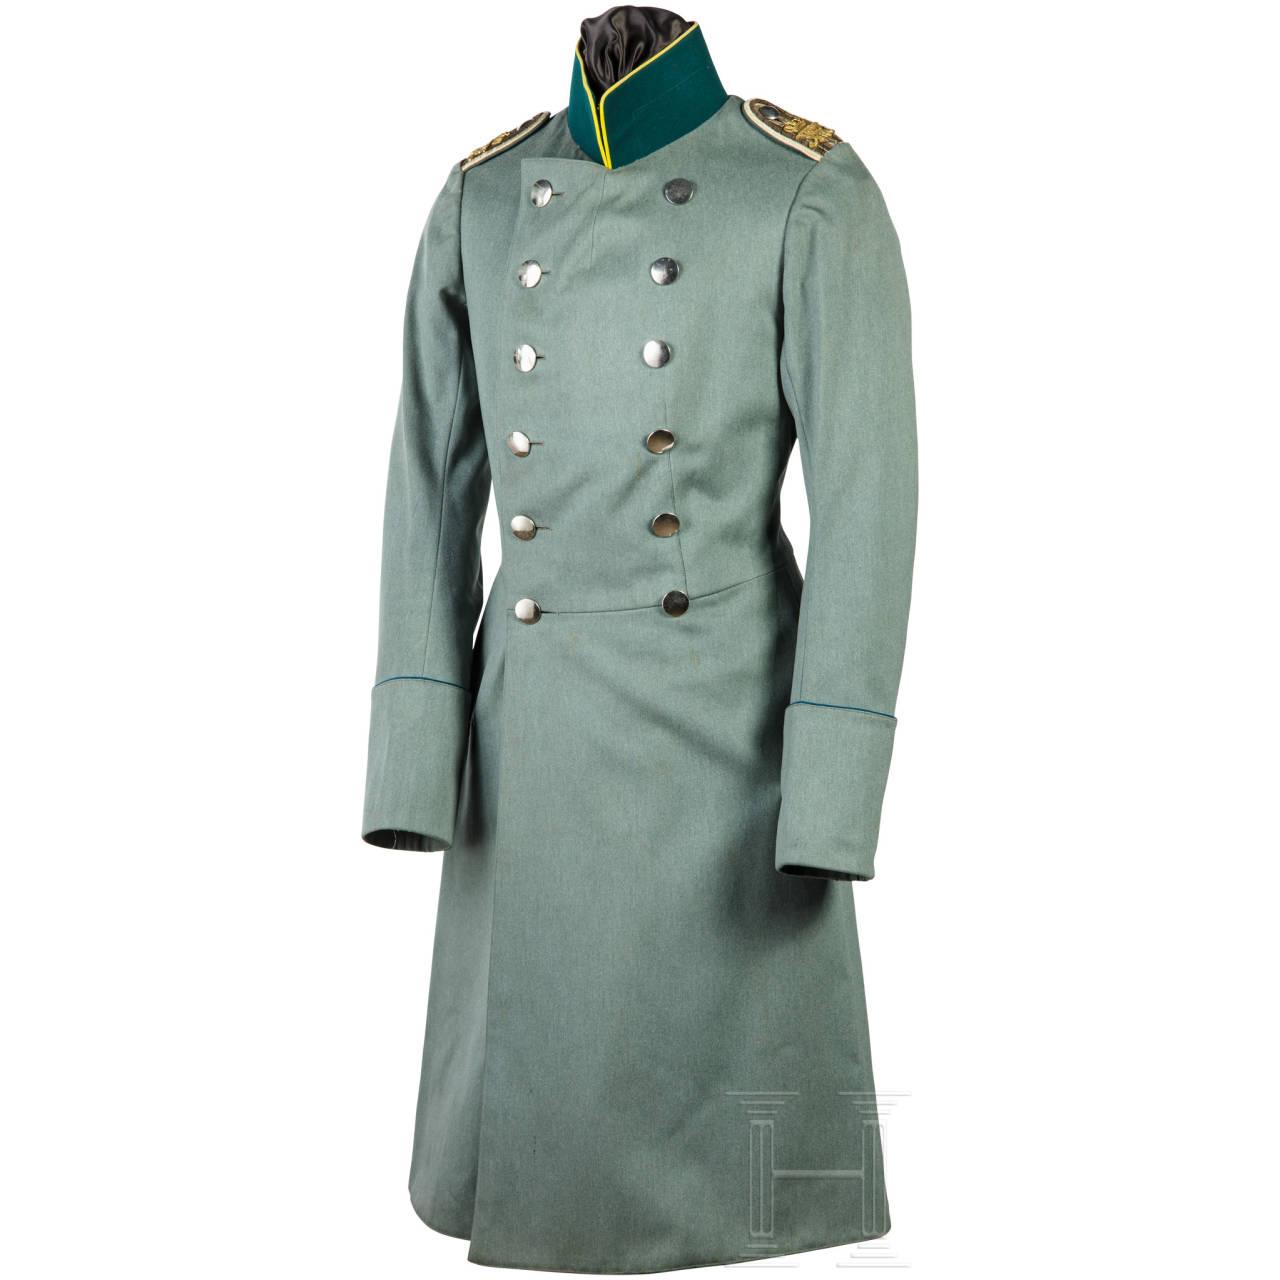 Overcoat for a Leutnant in the Regiment Königs-Jäger zu Pferde No. 1